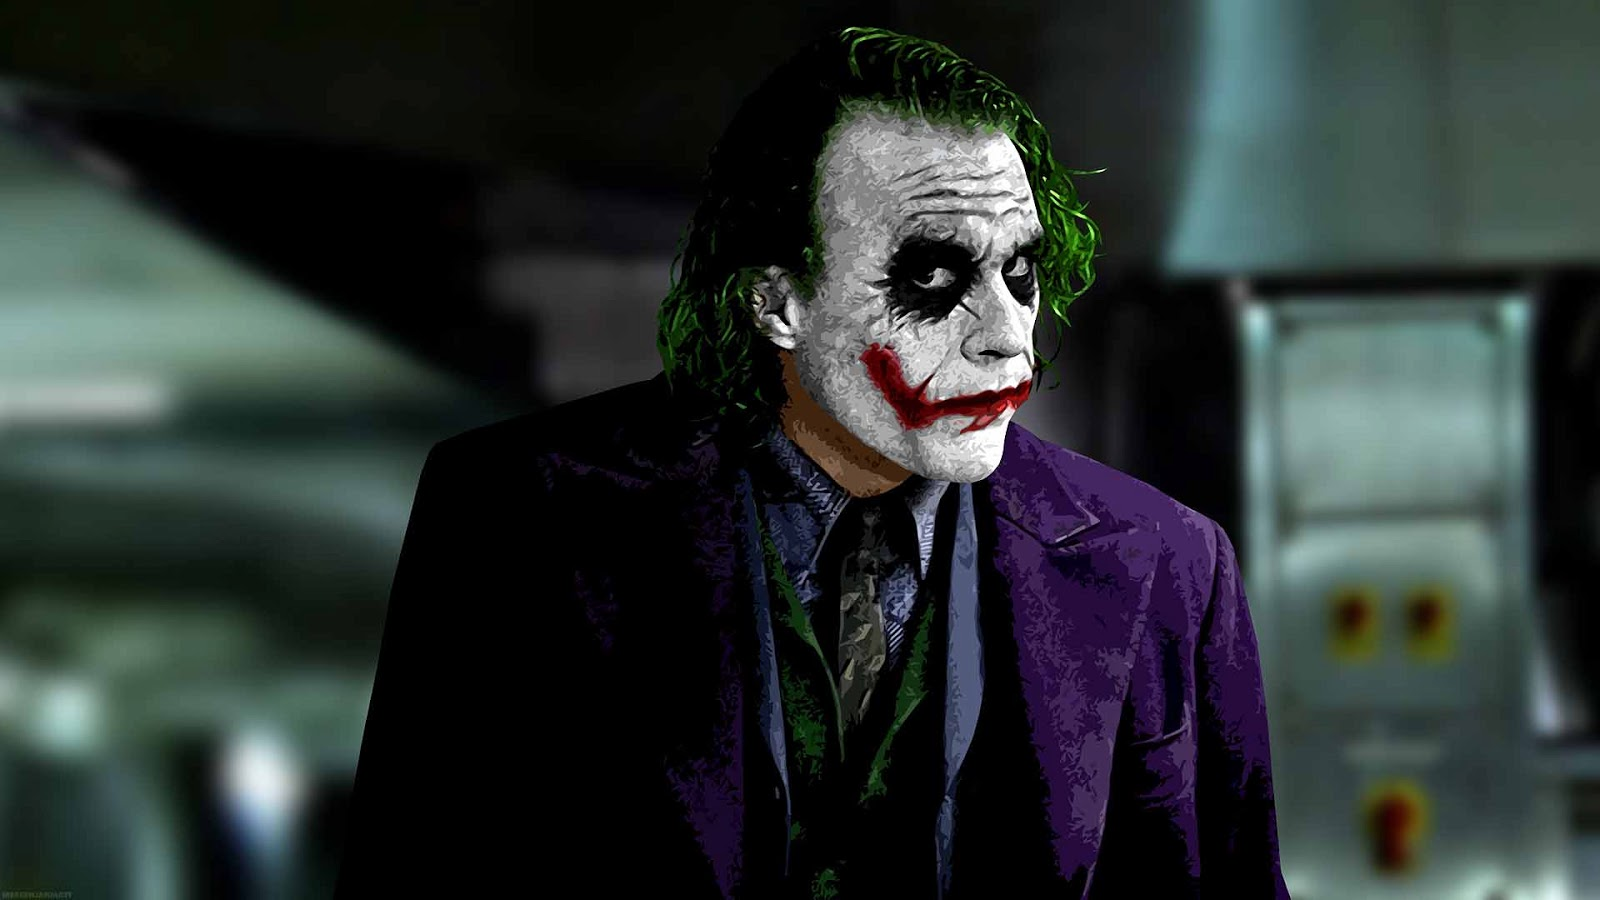 blogthis share to twitter share to facebook labels joker joker desktop 1600x900